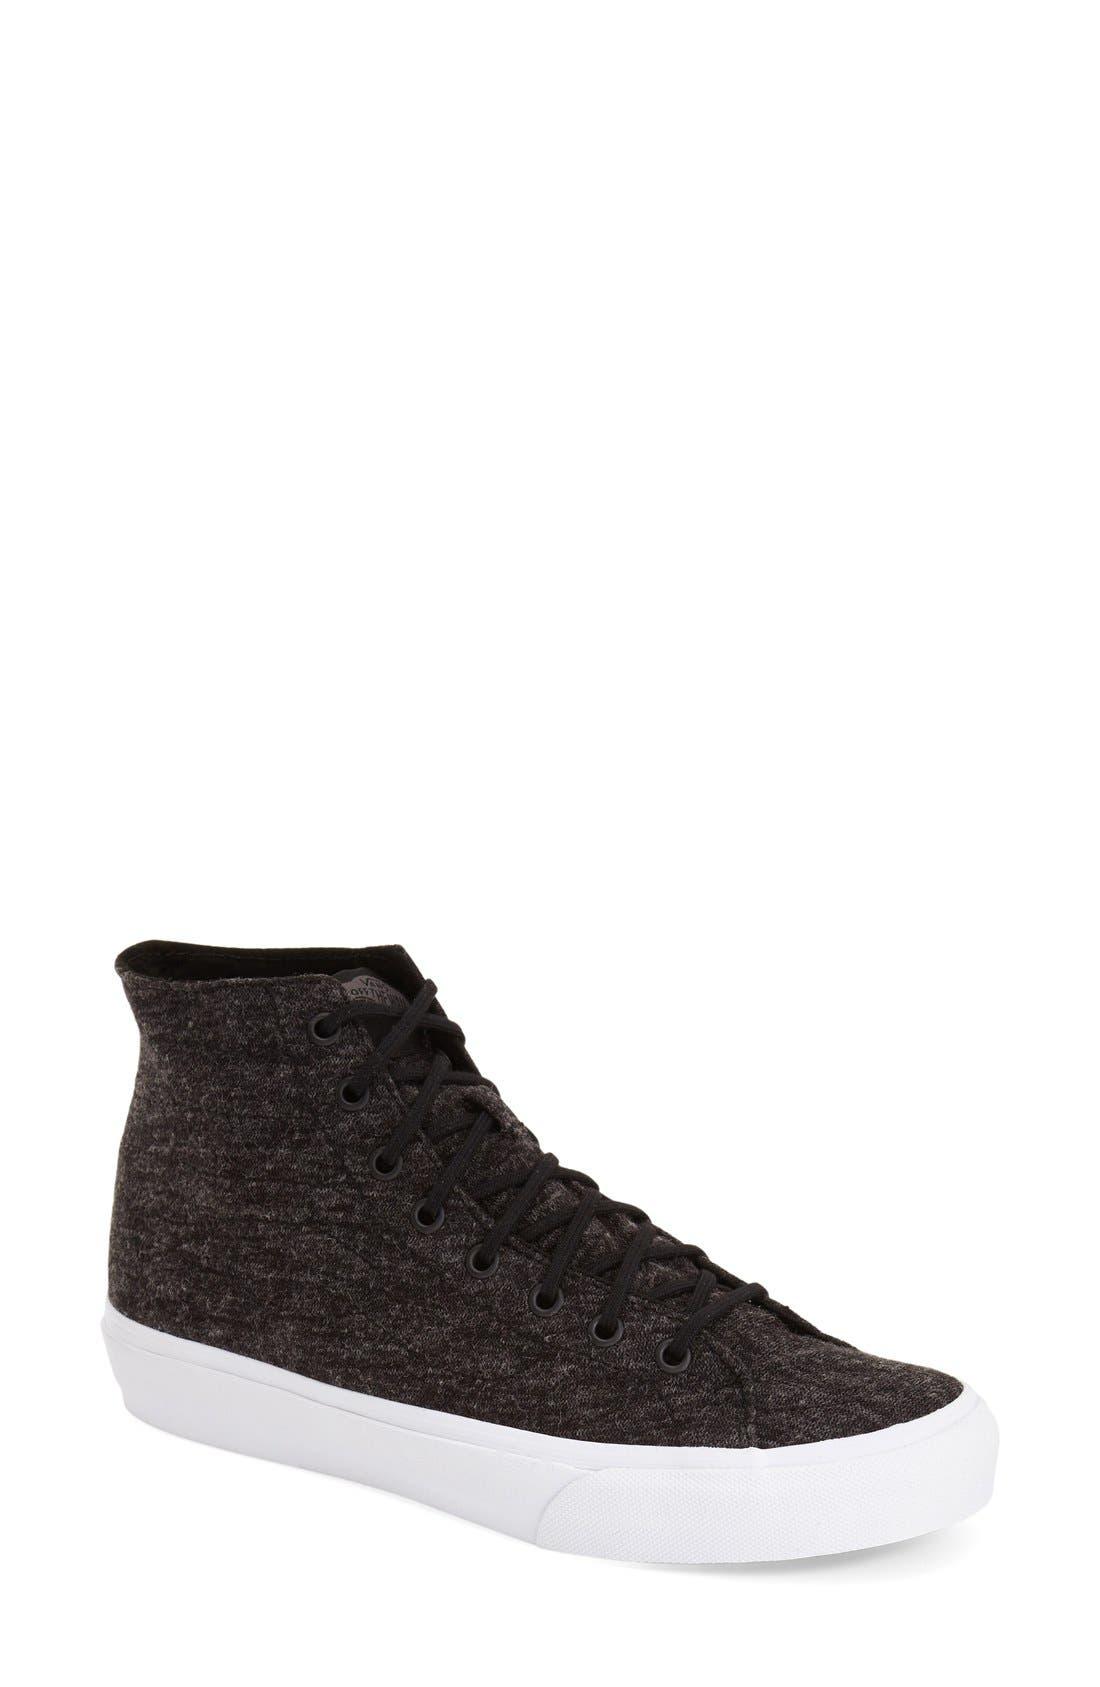 Alternate Image 1 Selected - Vans 'Sk8-Hi Decon' Sneaker (Women)